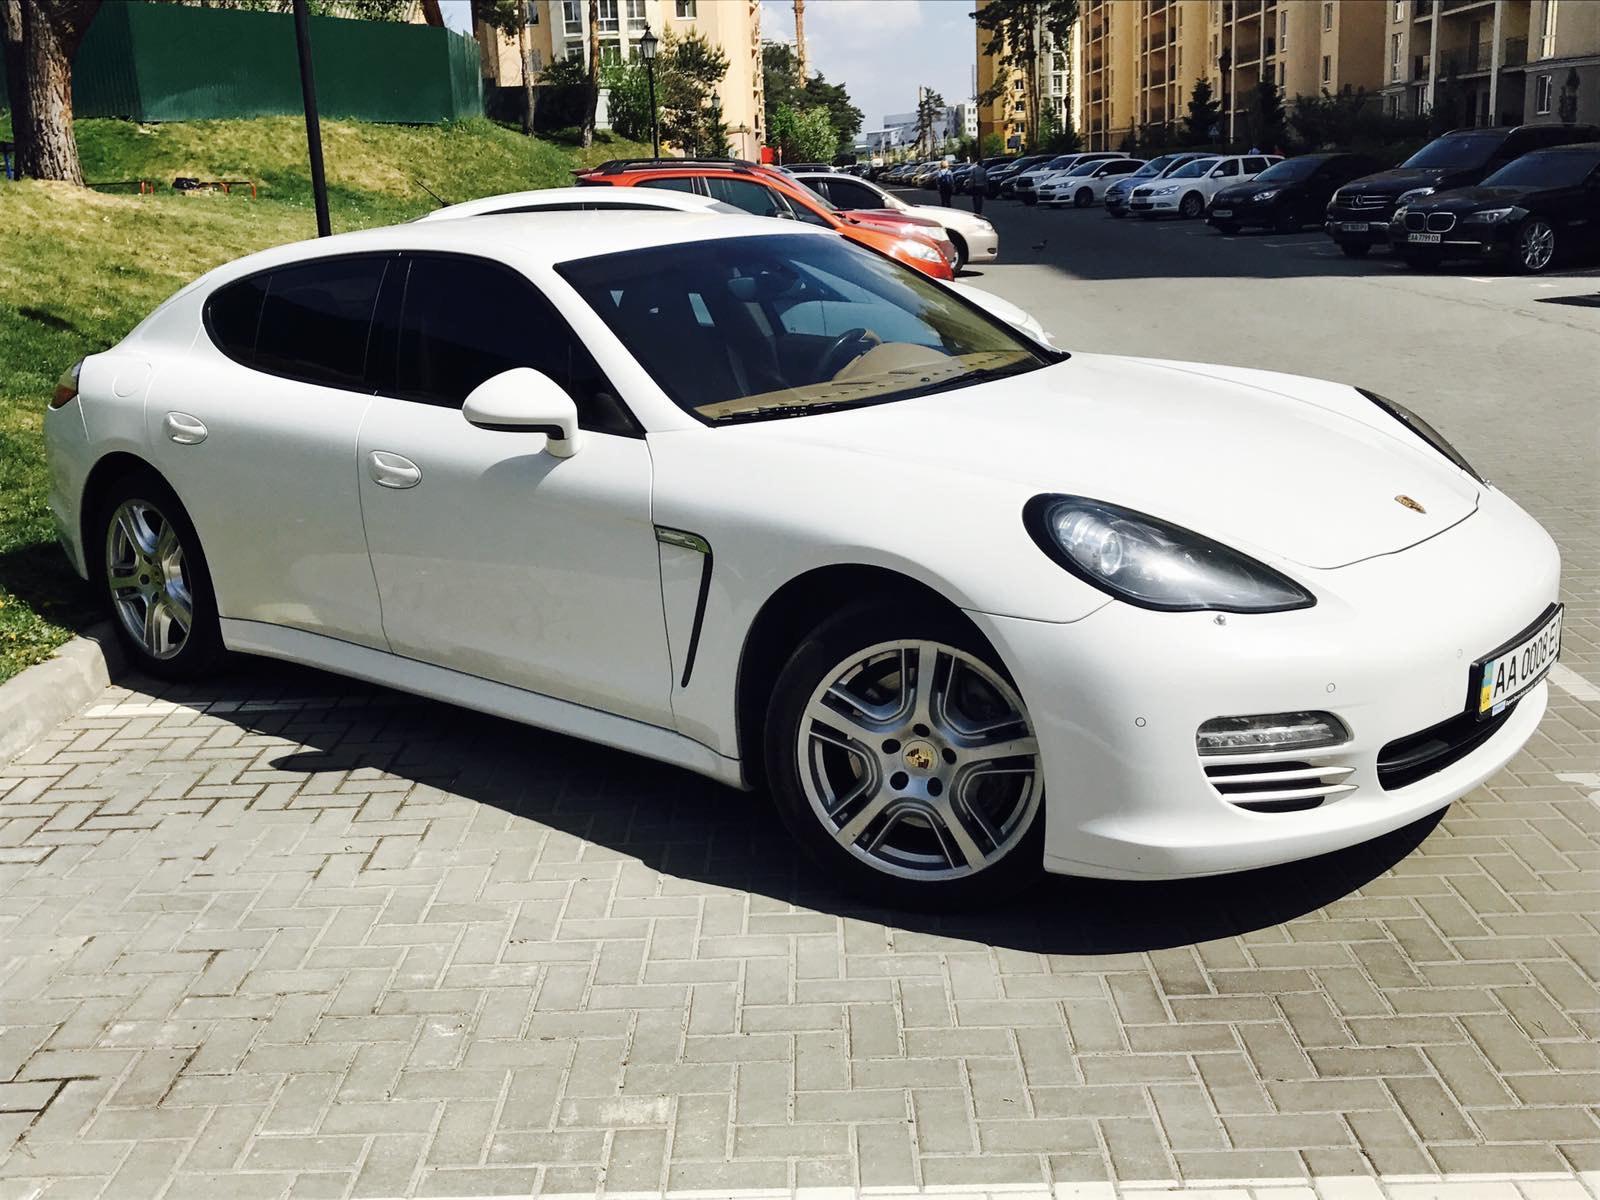 cabriolet, sports car rental in Kiev Porsche Panamera (2)